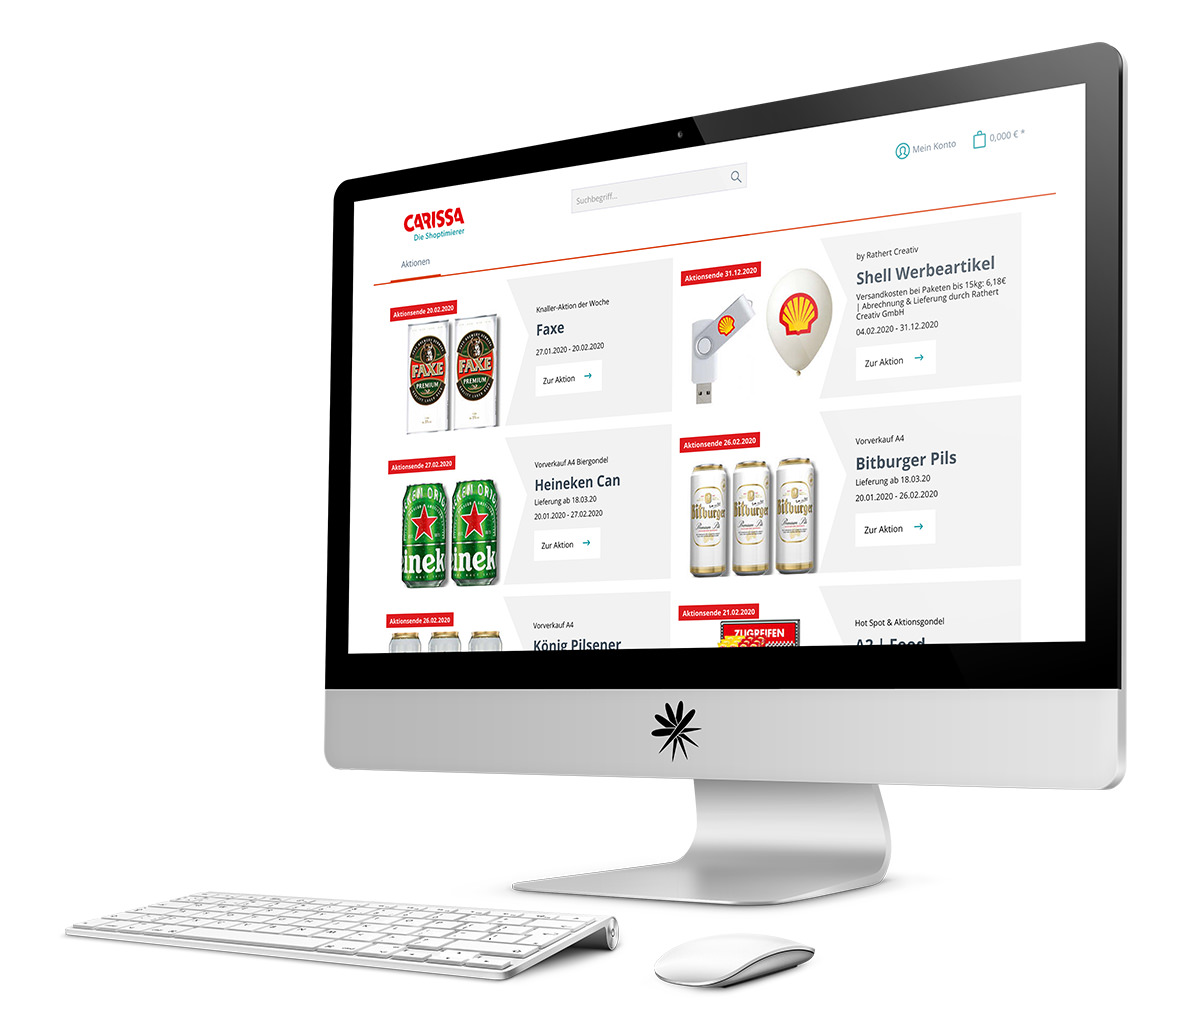 Projekt CARISSA Shopware Enterprise Edition Webshop